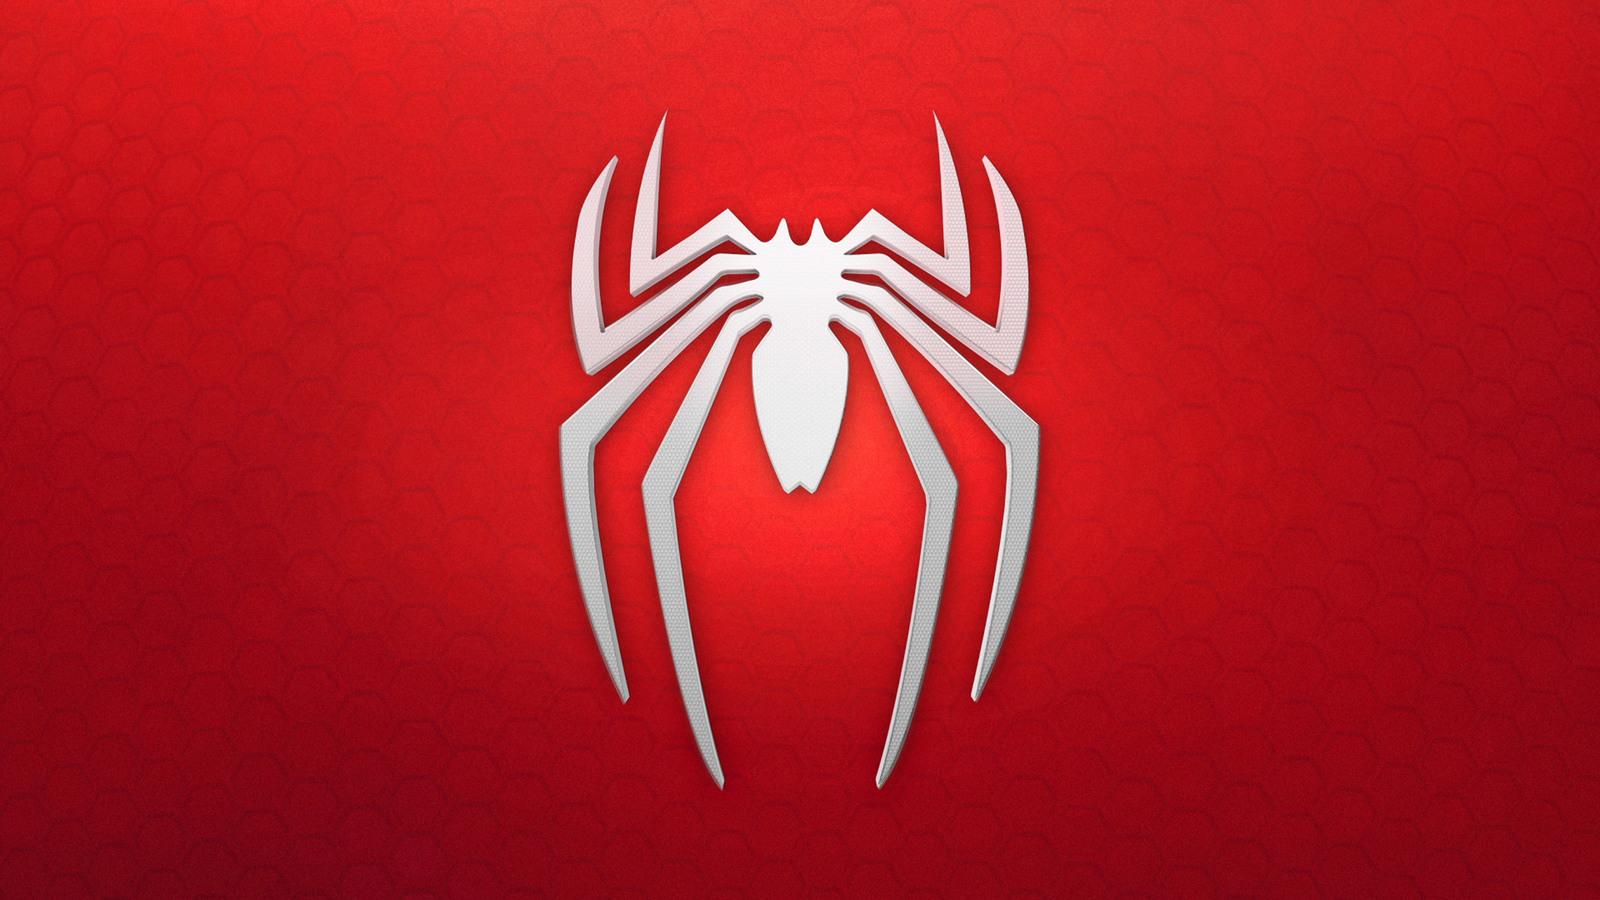 1600x900 spiderman 4k logo background 1600x900 resolution hd 4k